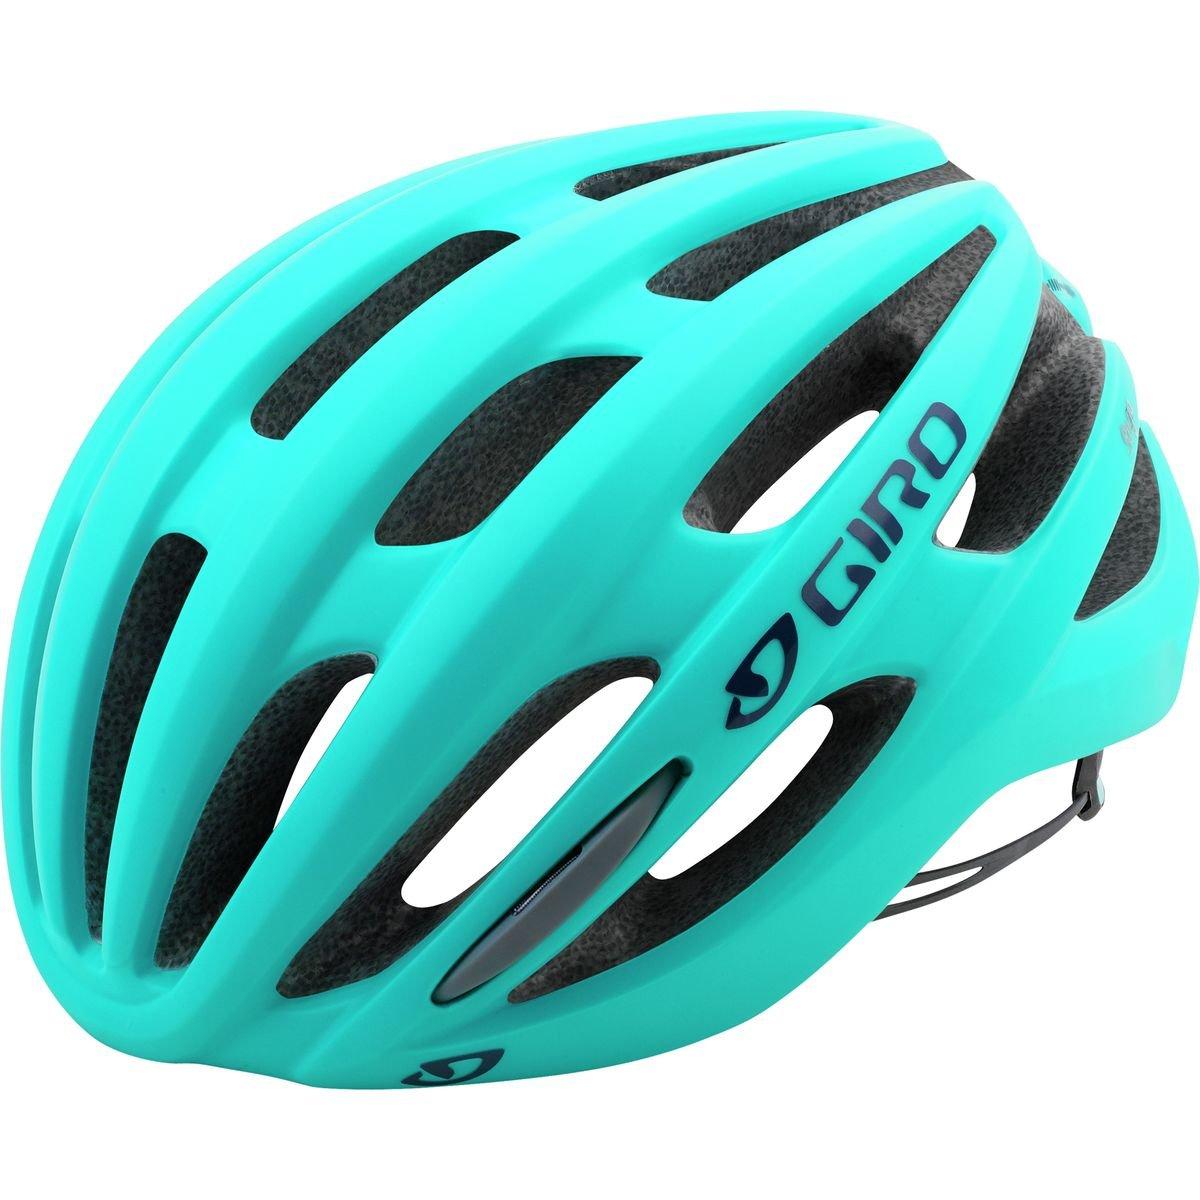 Giro Saga Cycling Helmet - Women's Matte Glacier Small